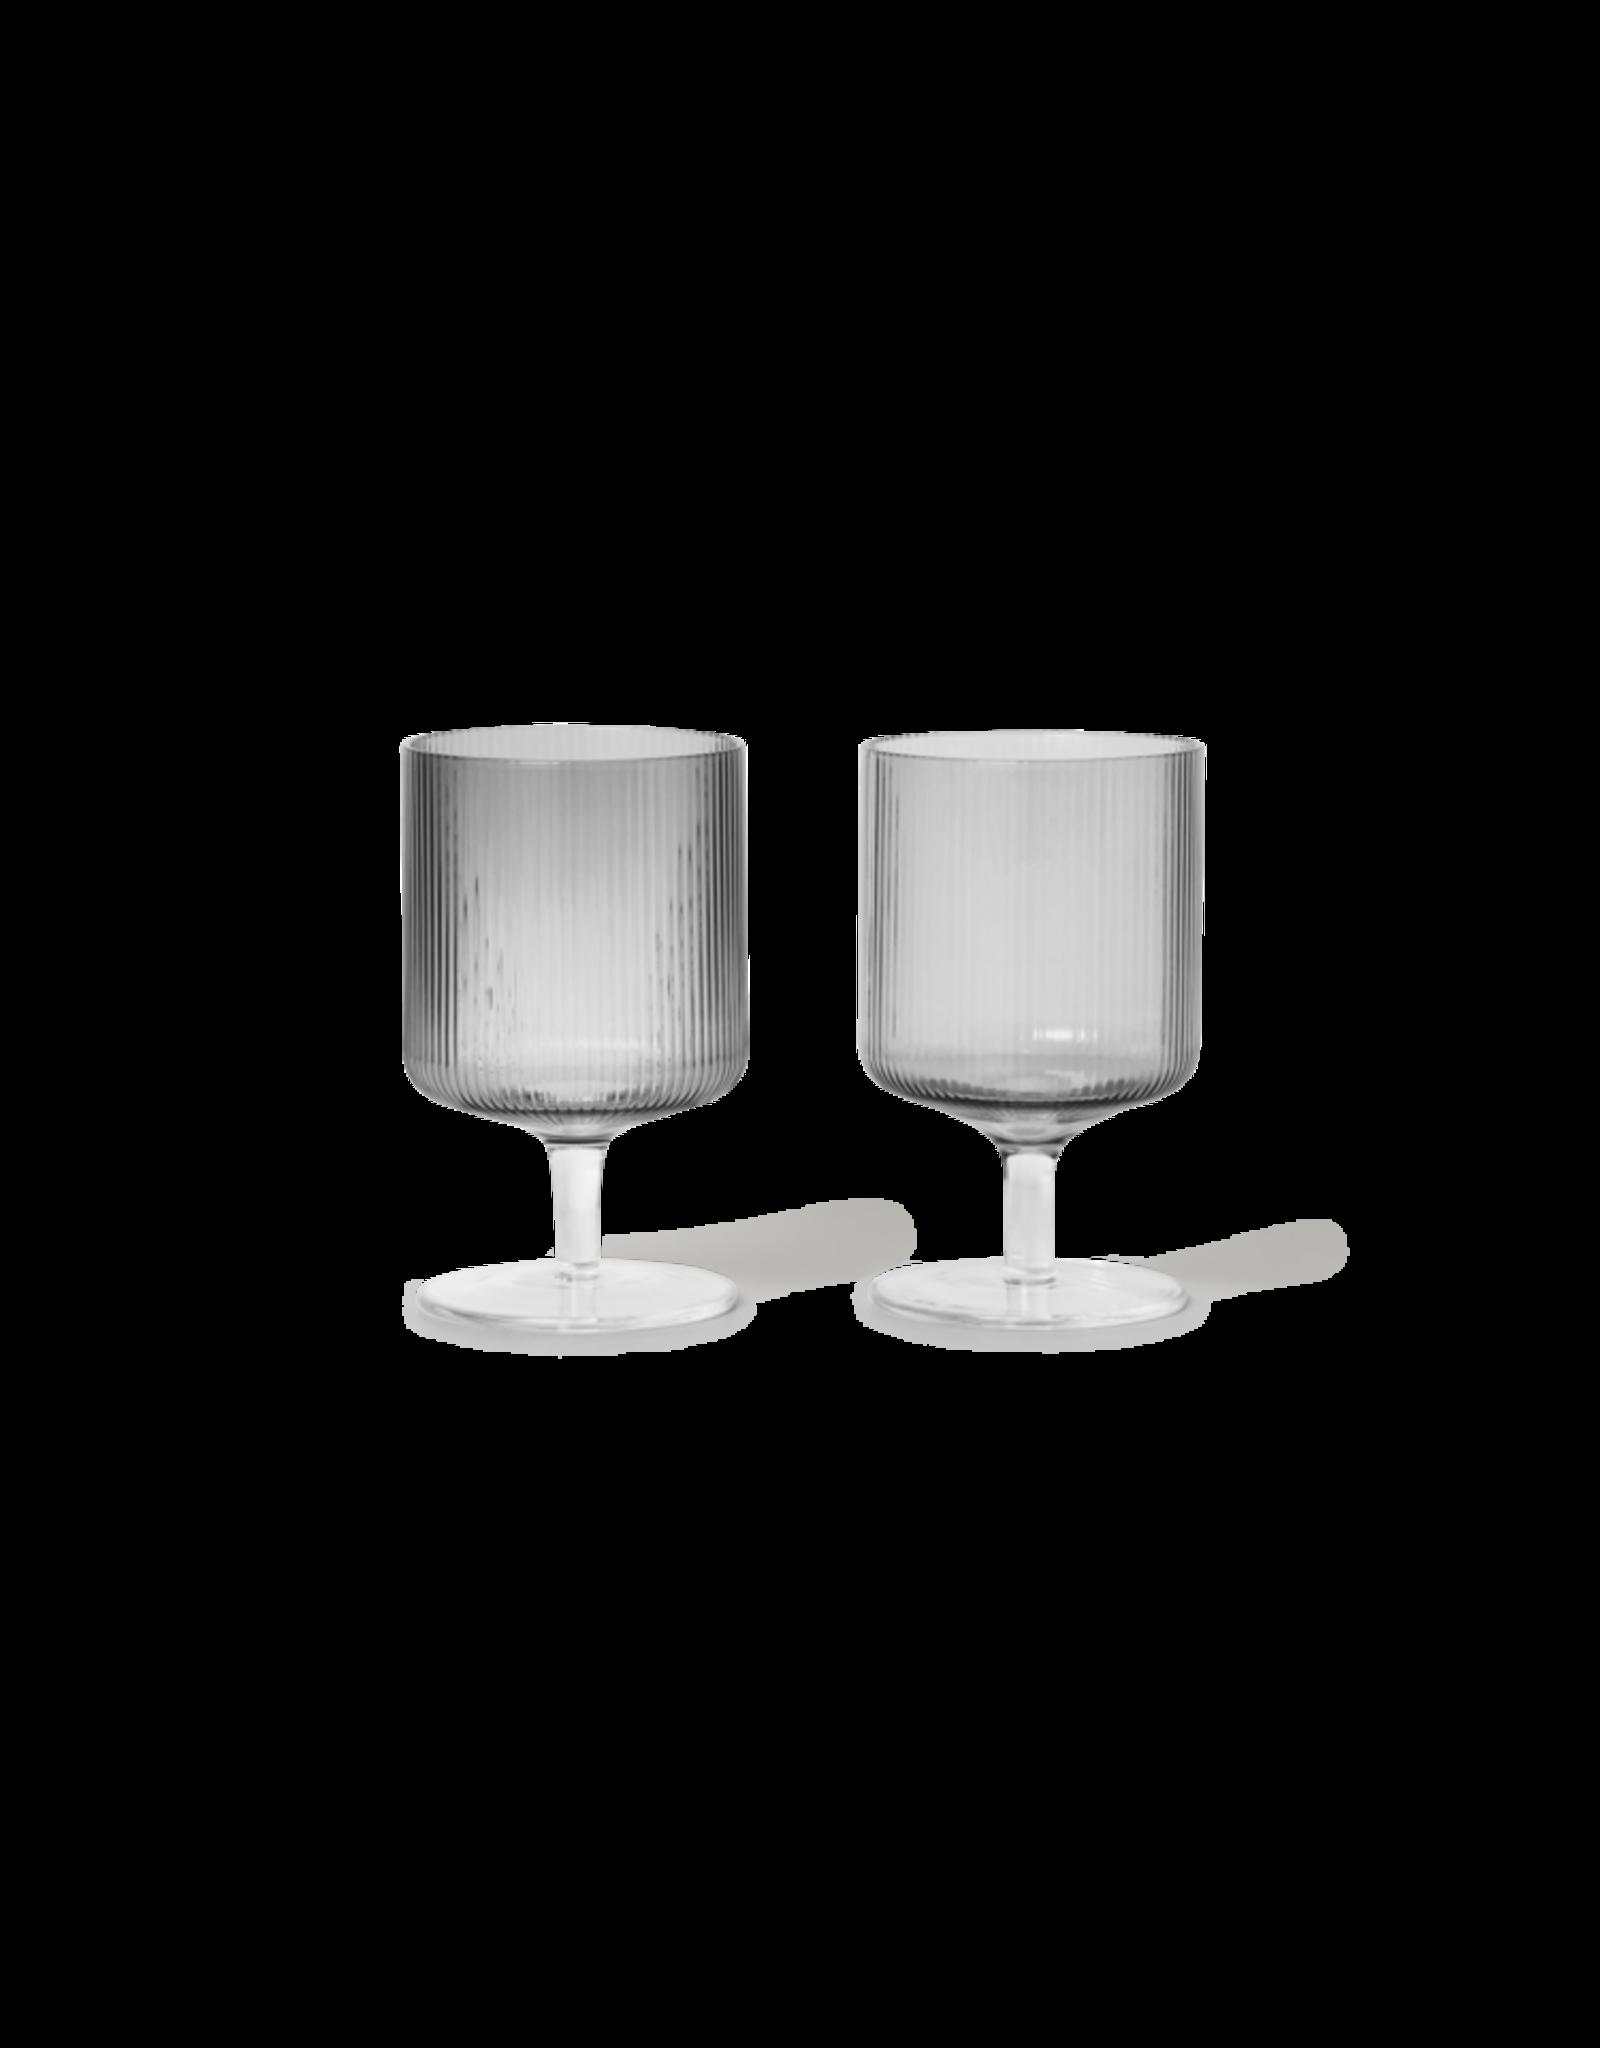 Ferm Living Ferm Living Ripple Wijn Glas - Set van 2 - Smoked Grey